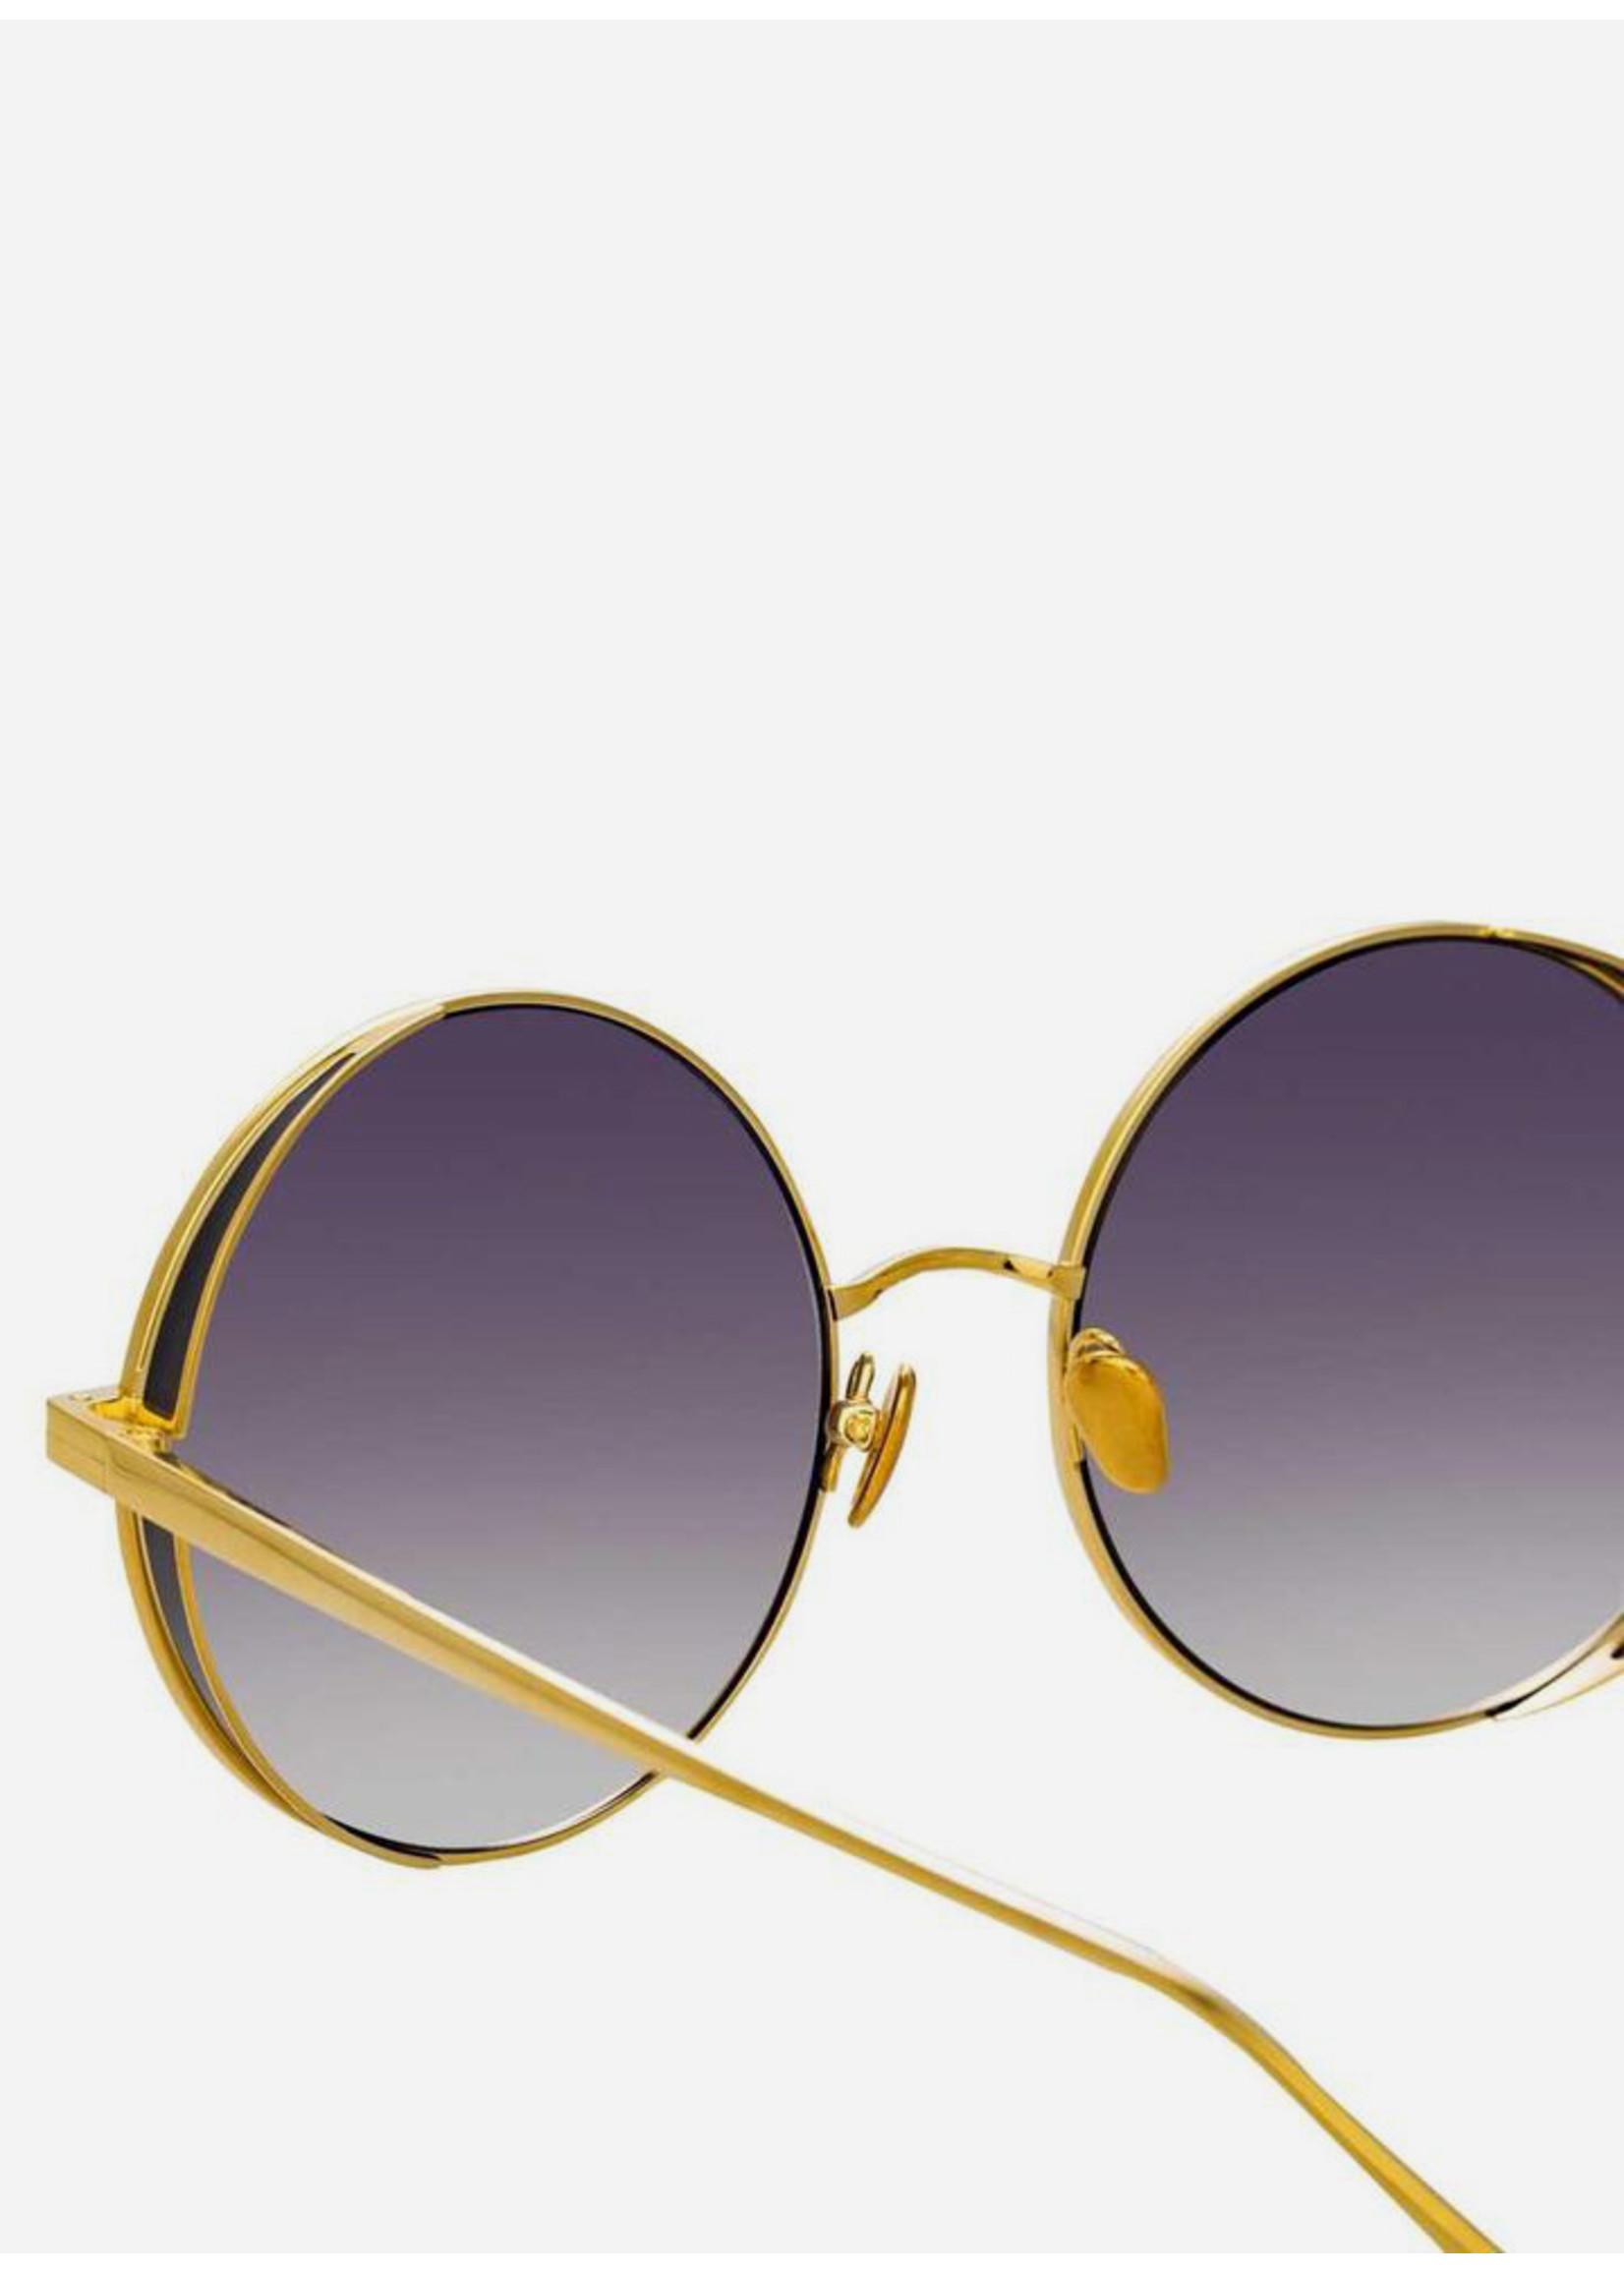 Linda Farrow Lockhart yellow gold